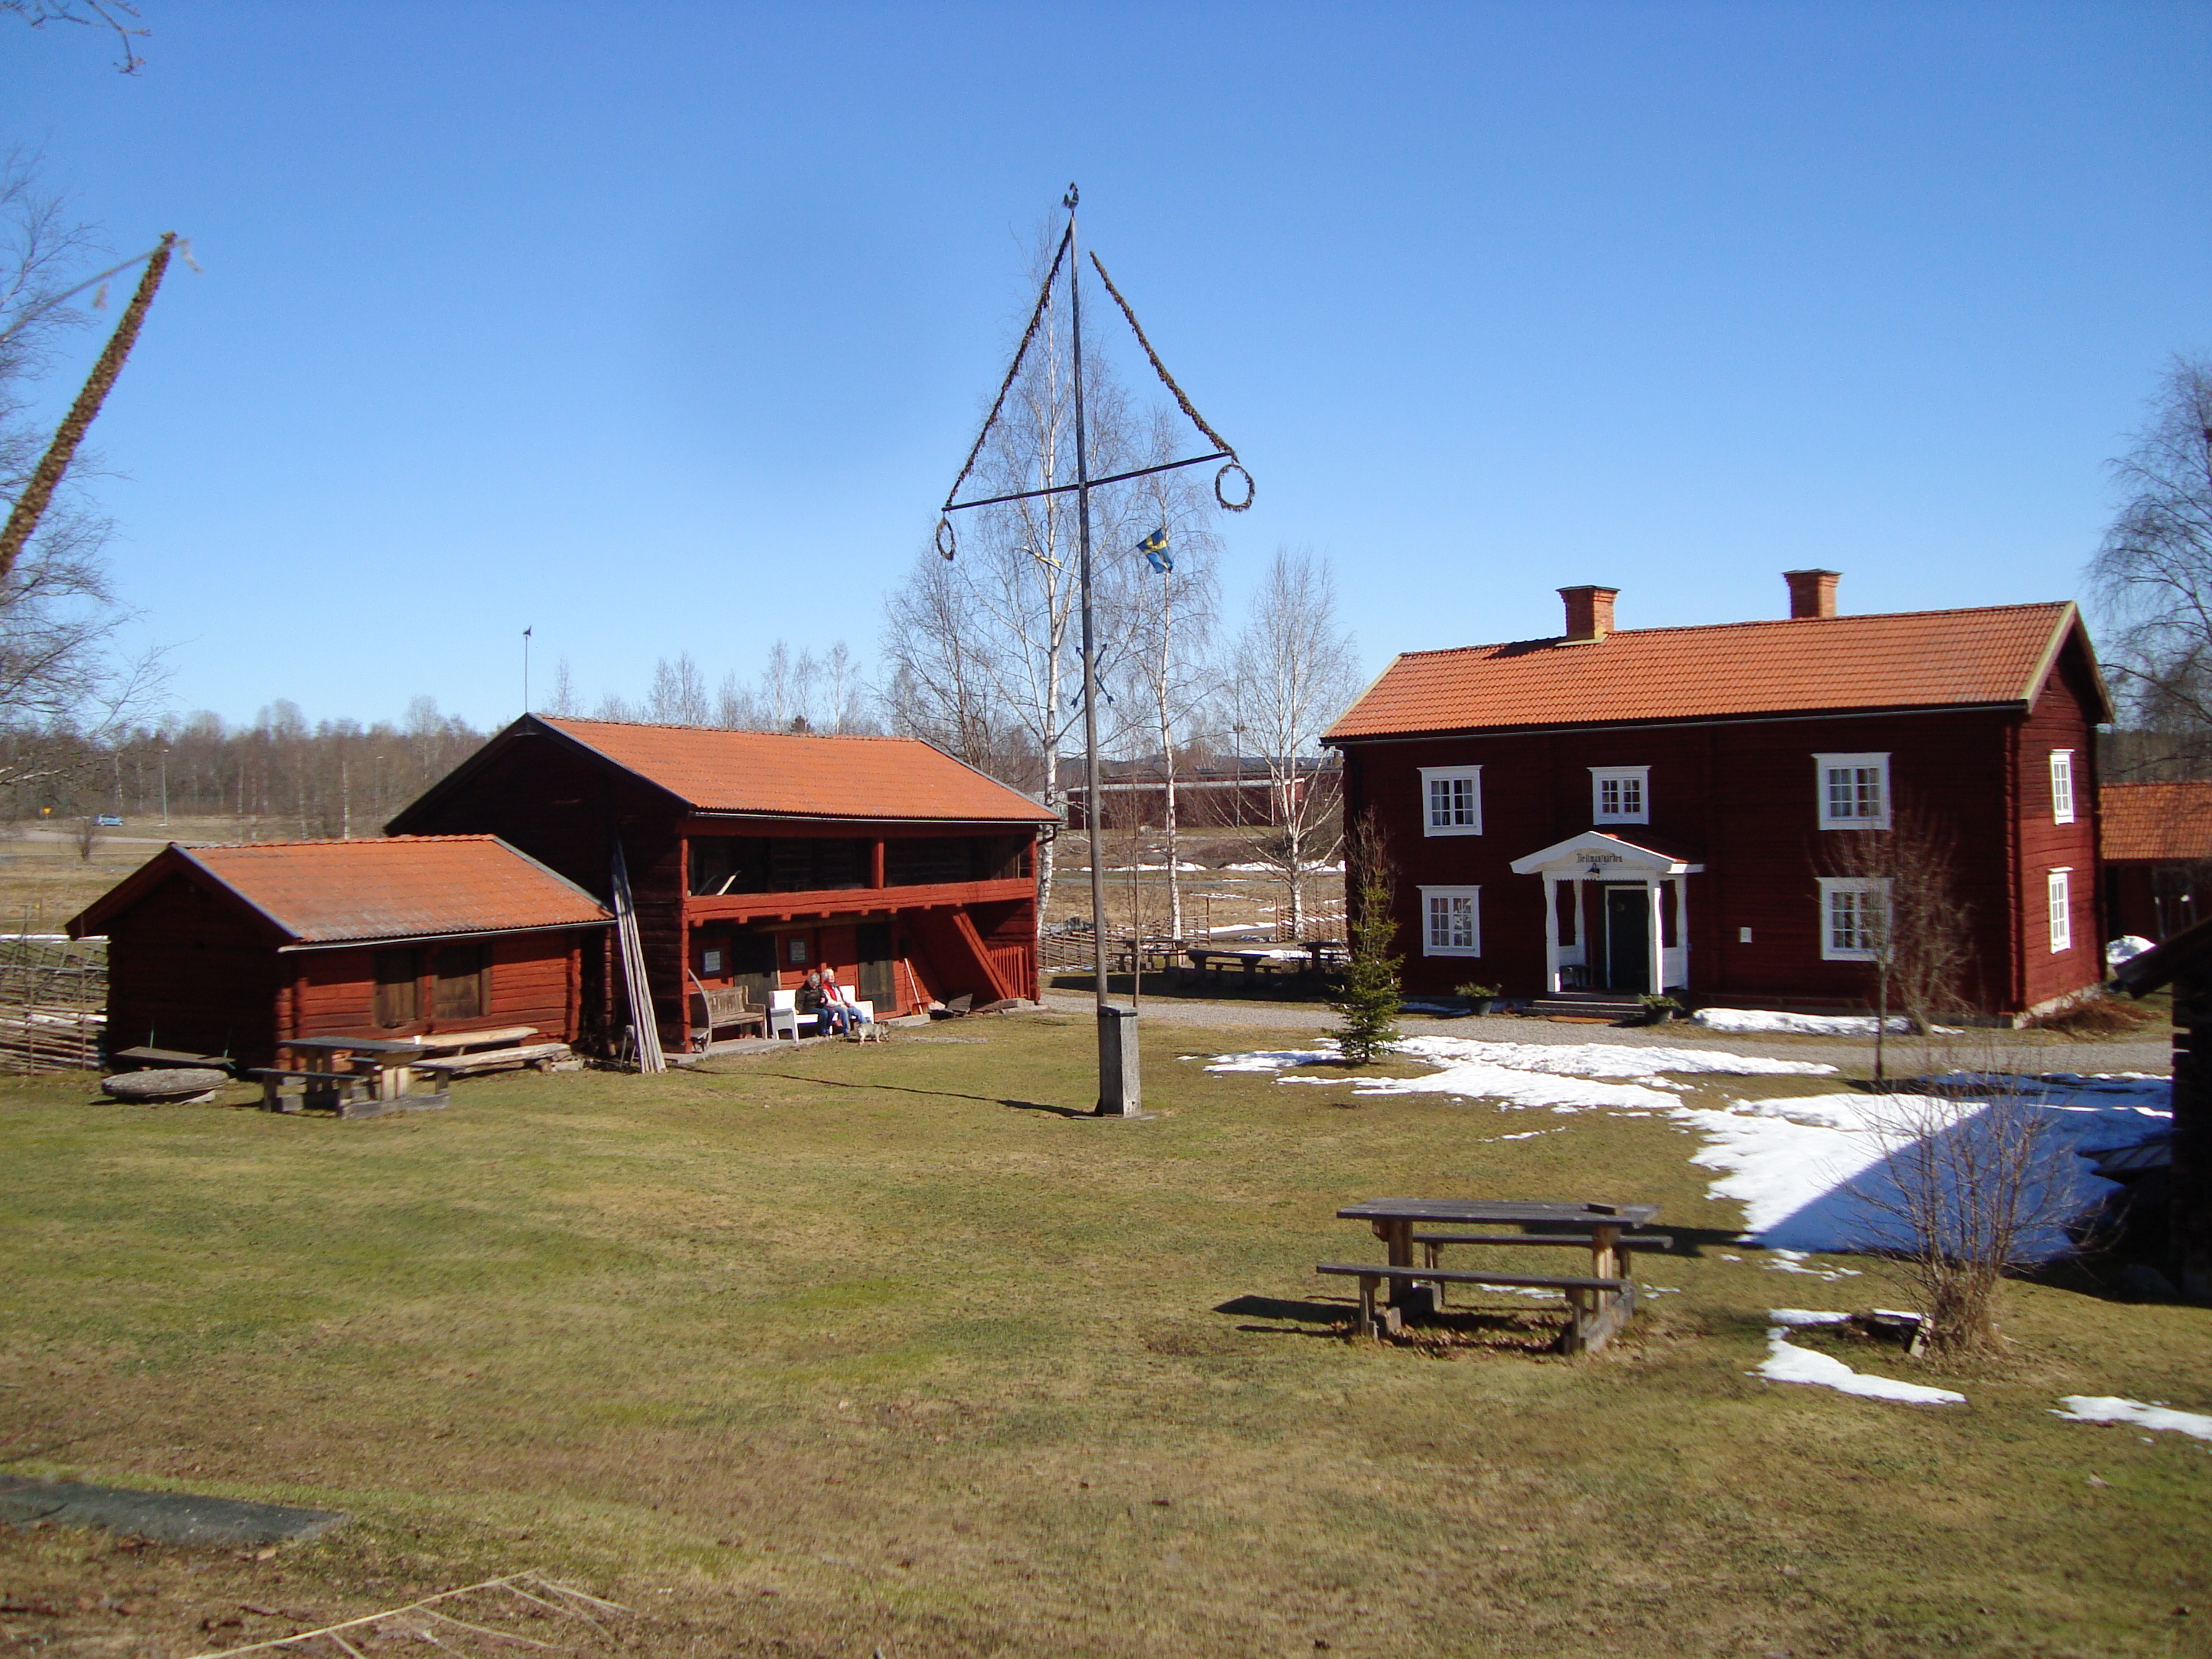 Norrbrke hembygdsgrd Smedjebacken | Visit Dalarna